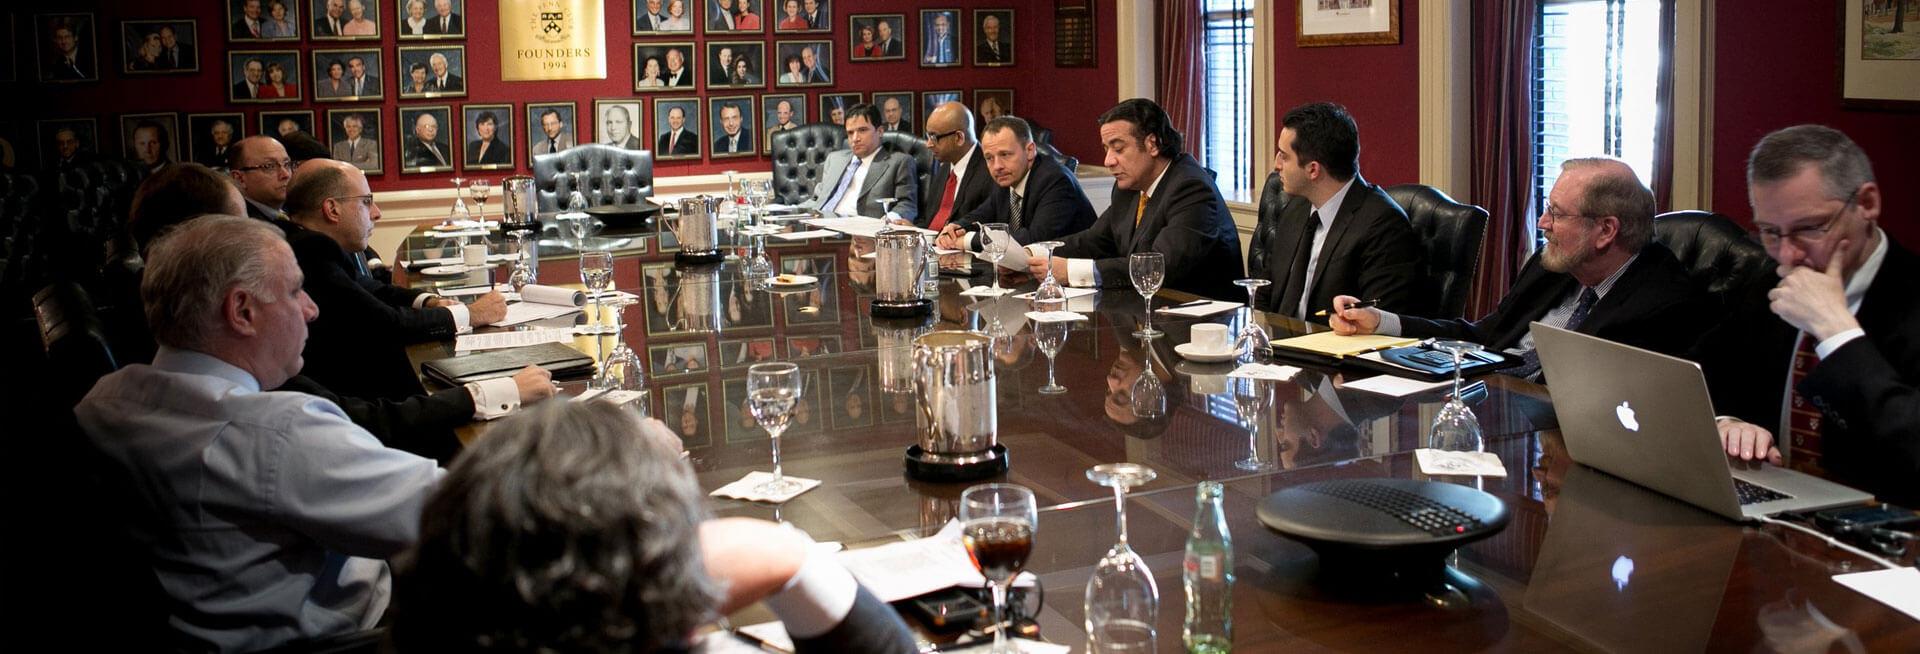 Blackhawk Partners Advisory Team